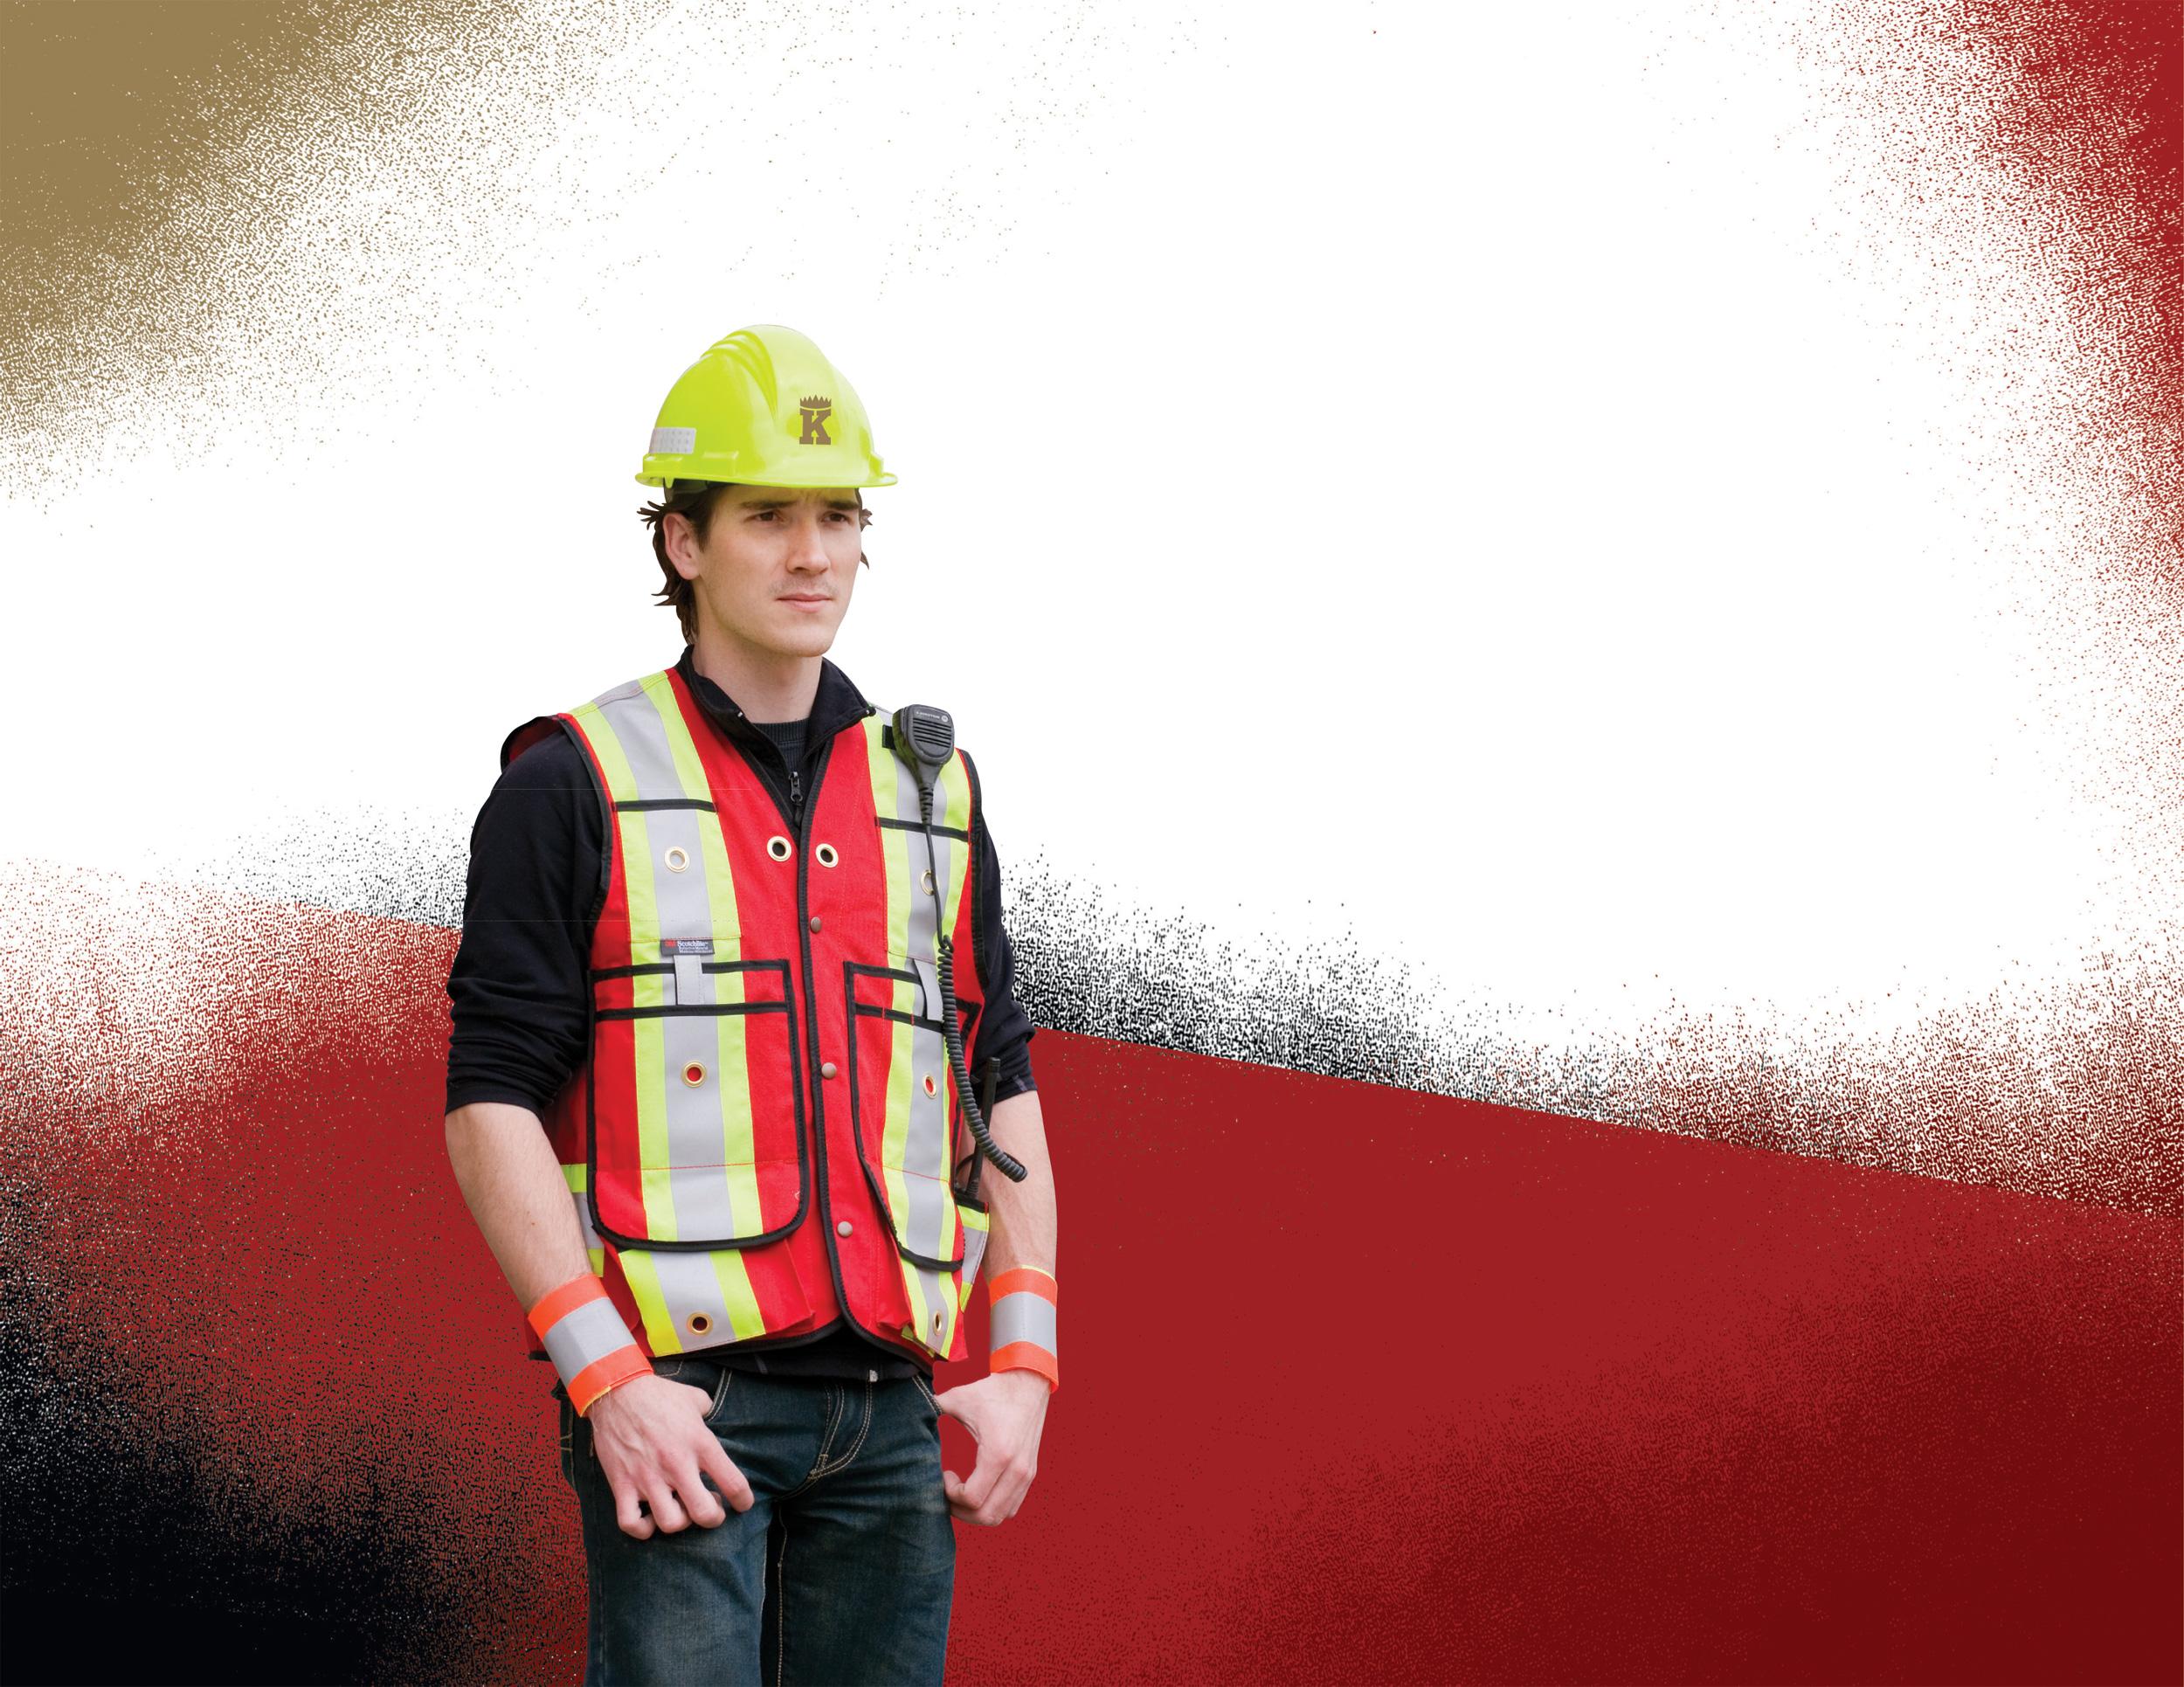 Surveyor Vests